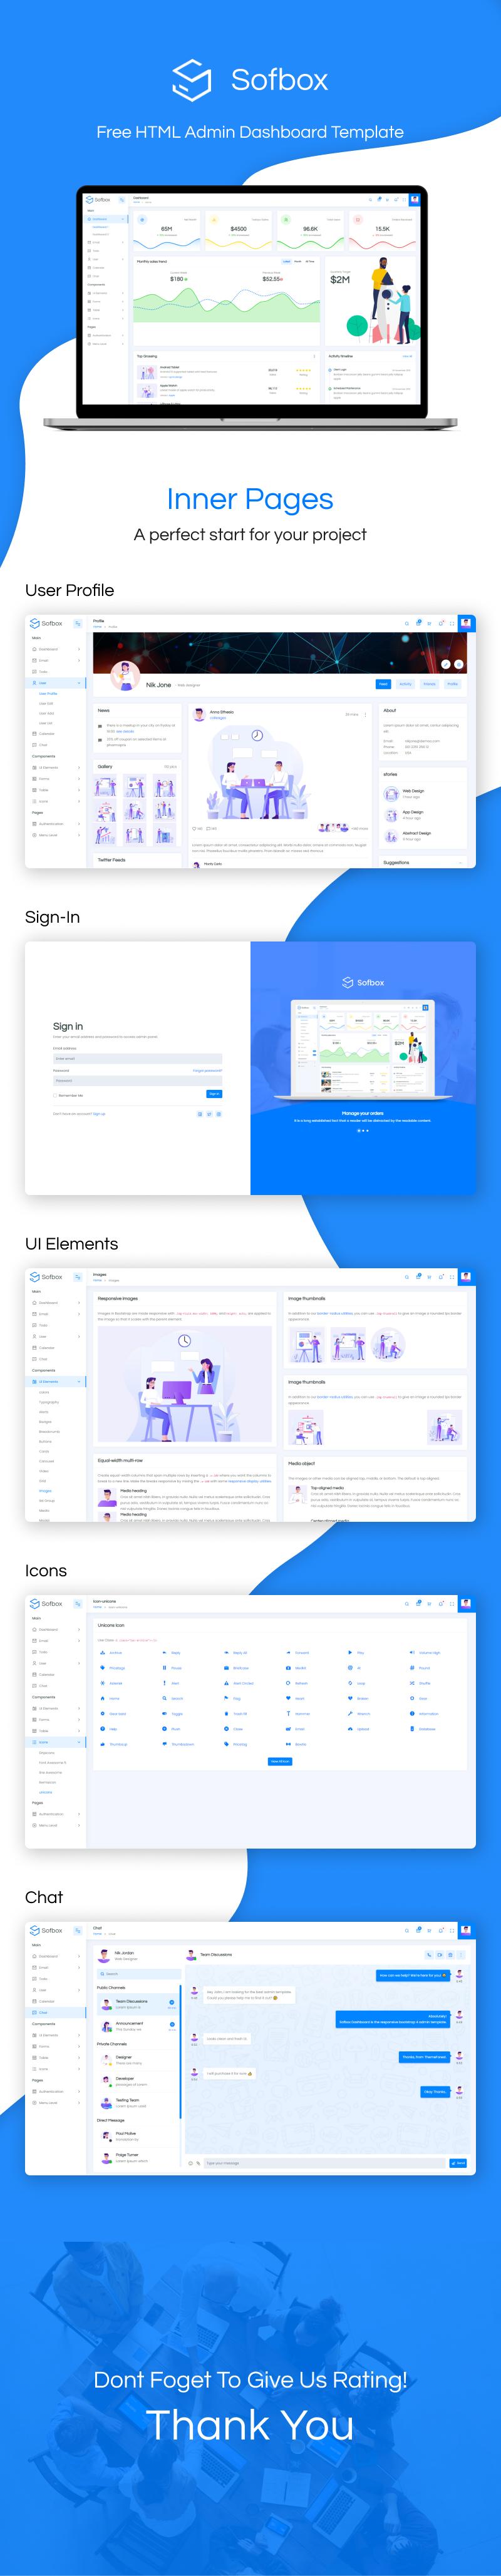 Free HTML Admin Dashboard Template | Sofbox Admin Lite | Iqonic Design free html admin dashboard template Sofbox Admin Lite Sofbox 20Long 20Preview